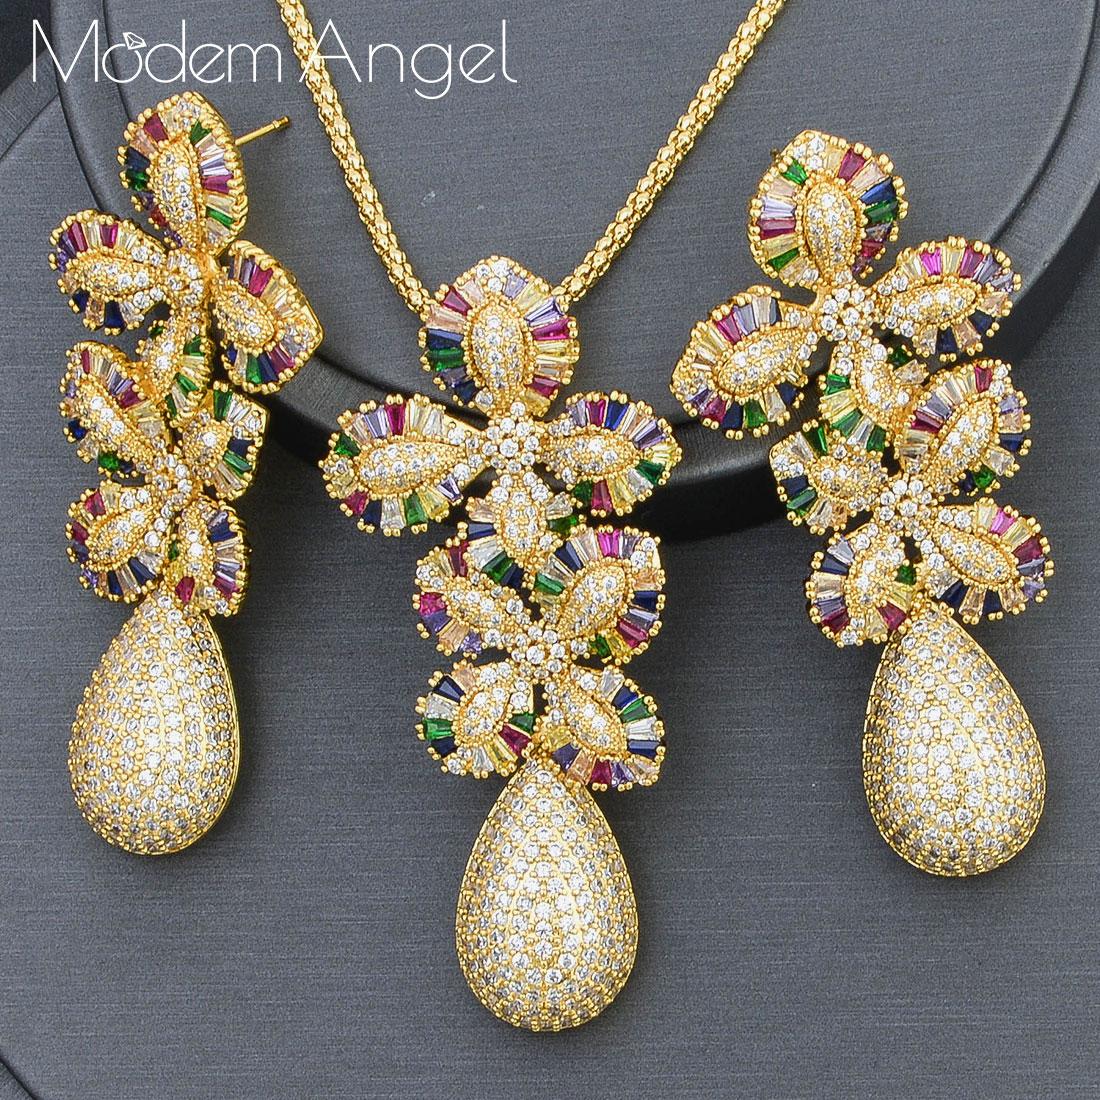 ModemAngel الفاخرة ليف قطرة زهرة كامل مايكرو زركون قلادة قلادة أقراط للنساء دبي مجوهرات عالية الجودة